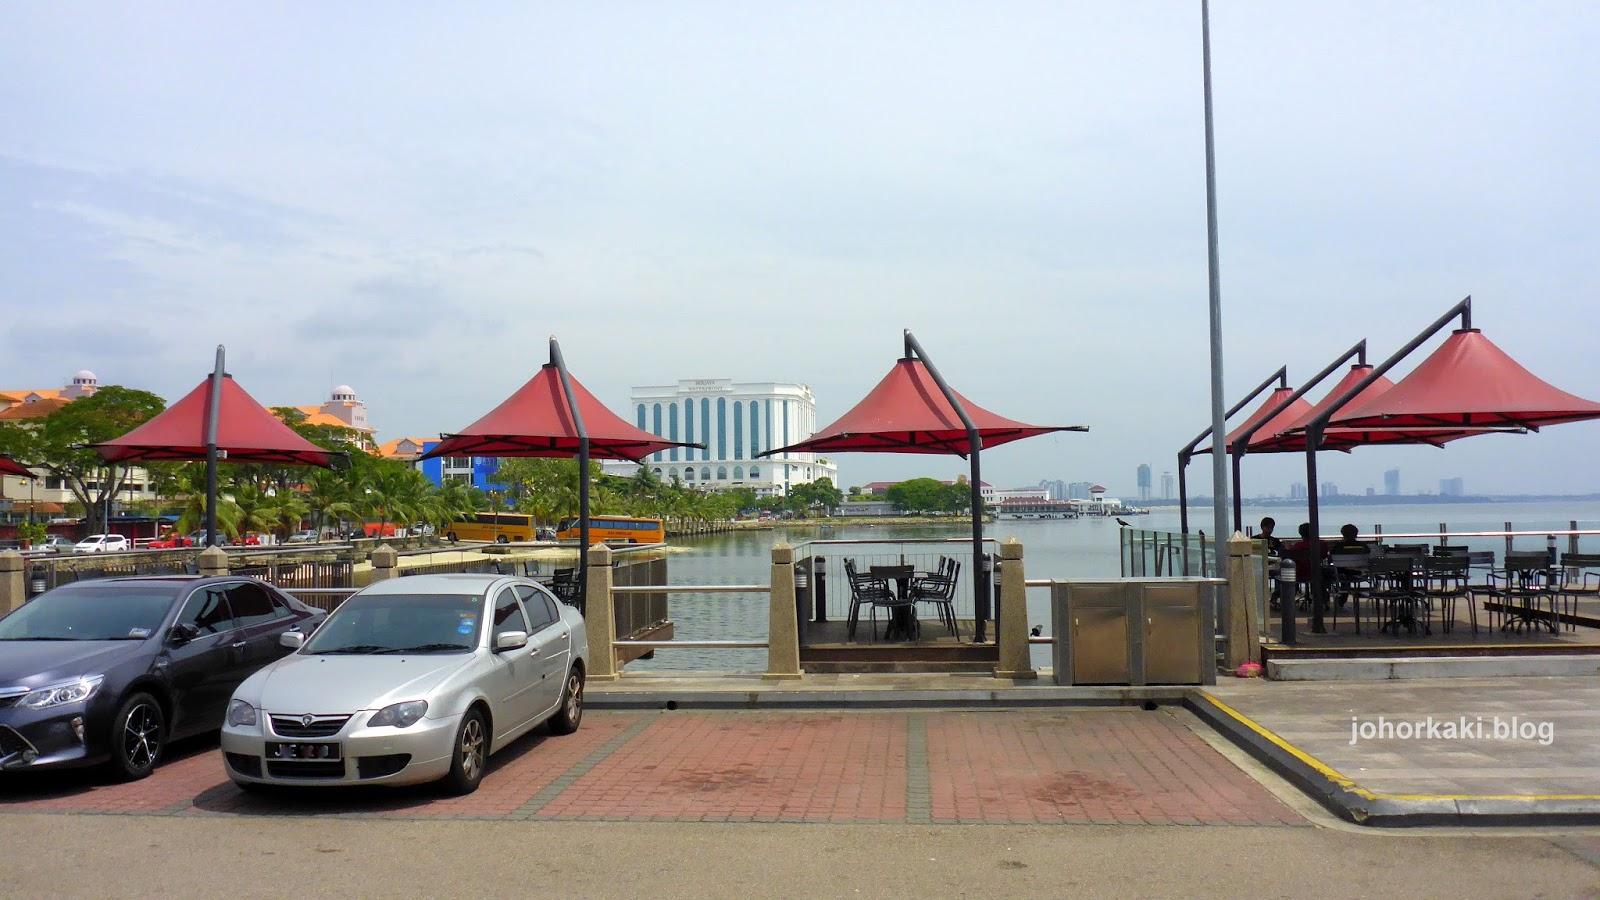 Kentucky Fried Chicken KFC Stulang Laut in Johor Bahru JB joHoR kAki  #396292